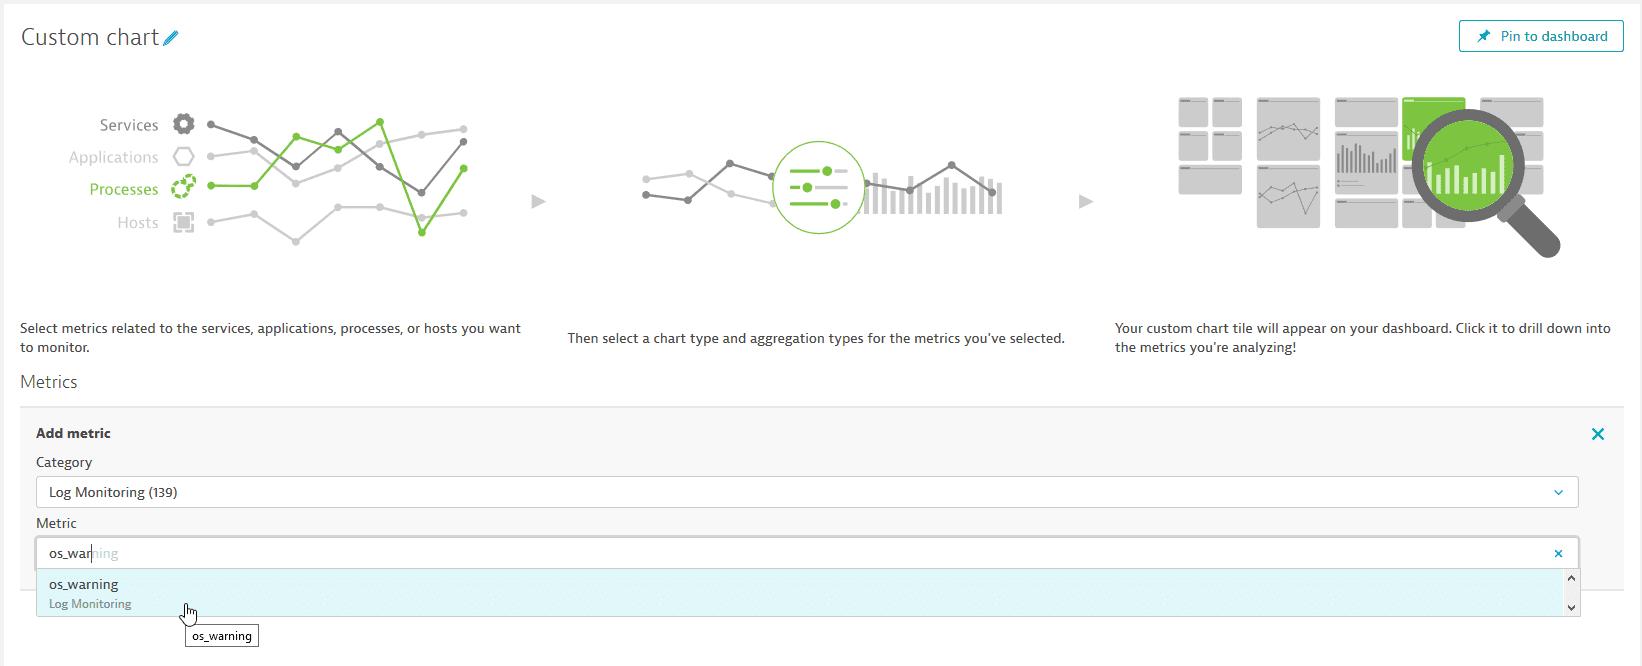 creating chart based on custom metric